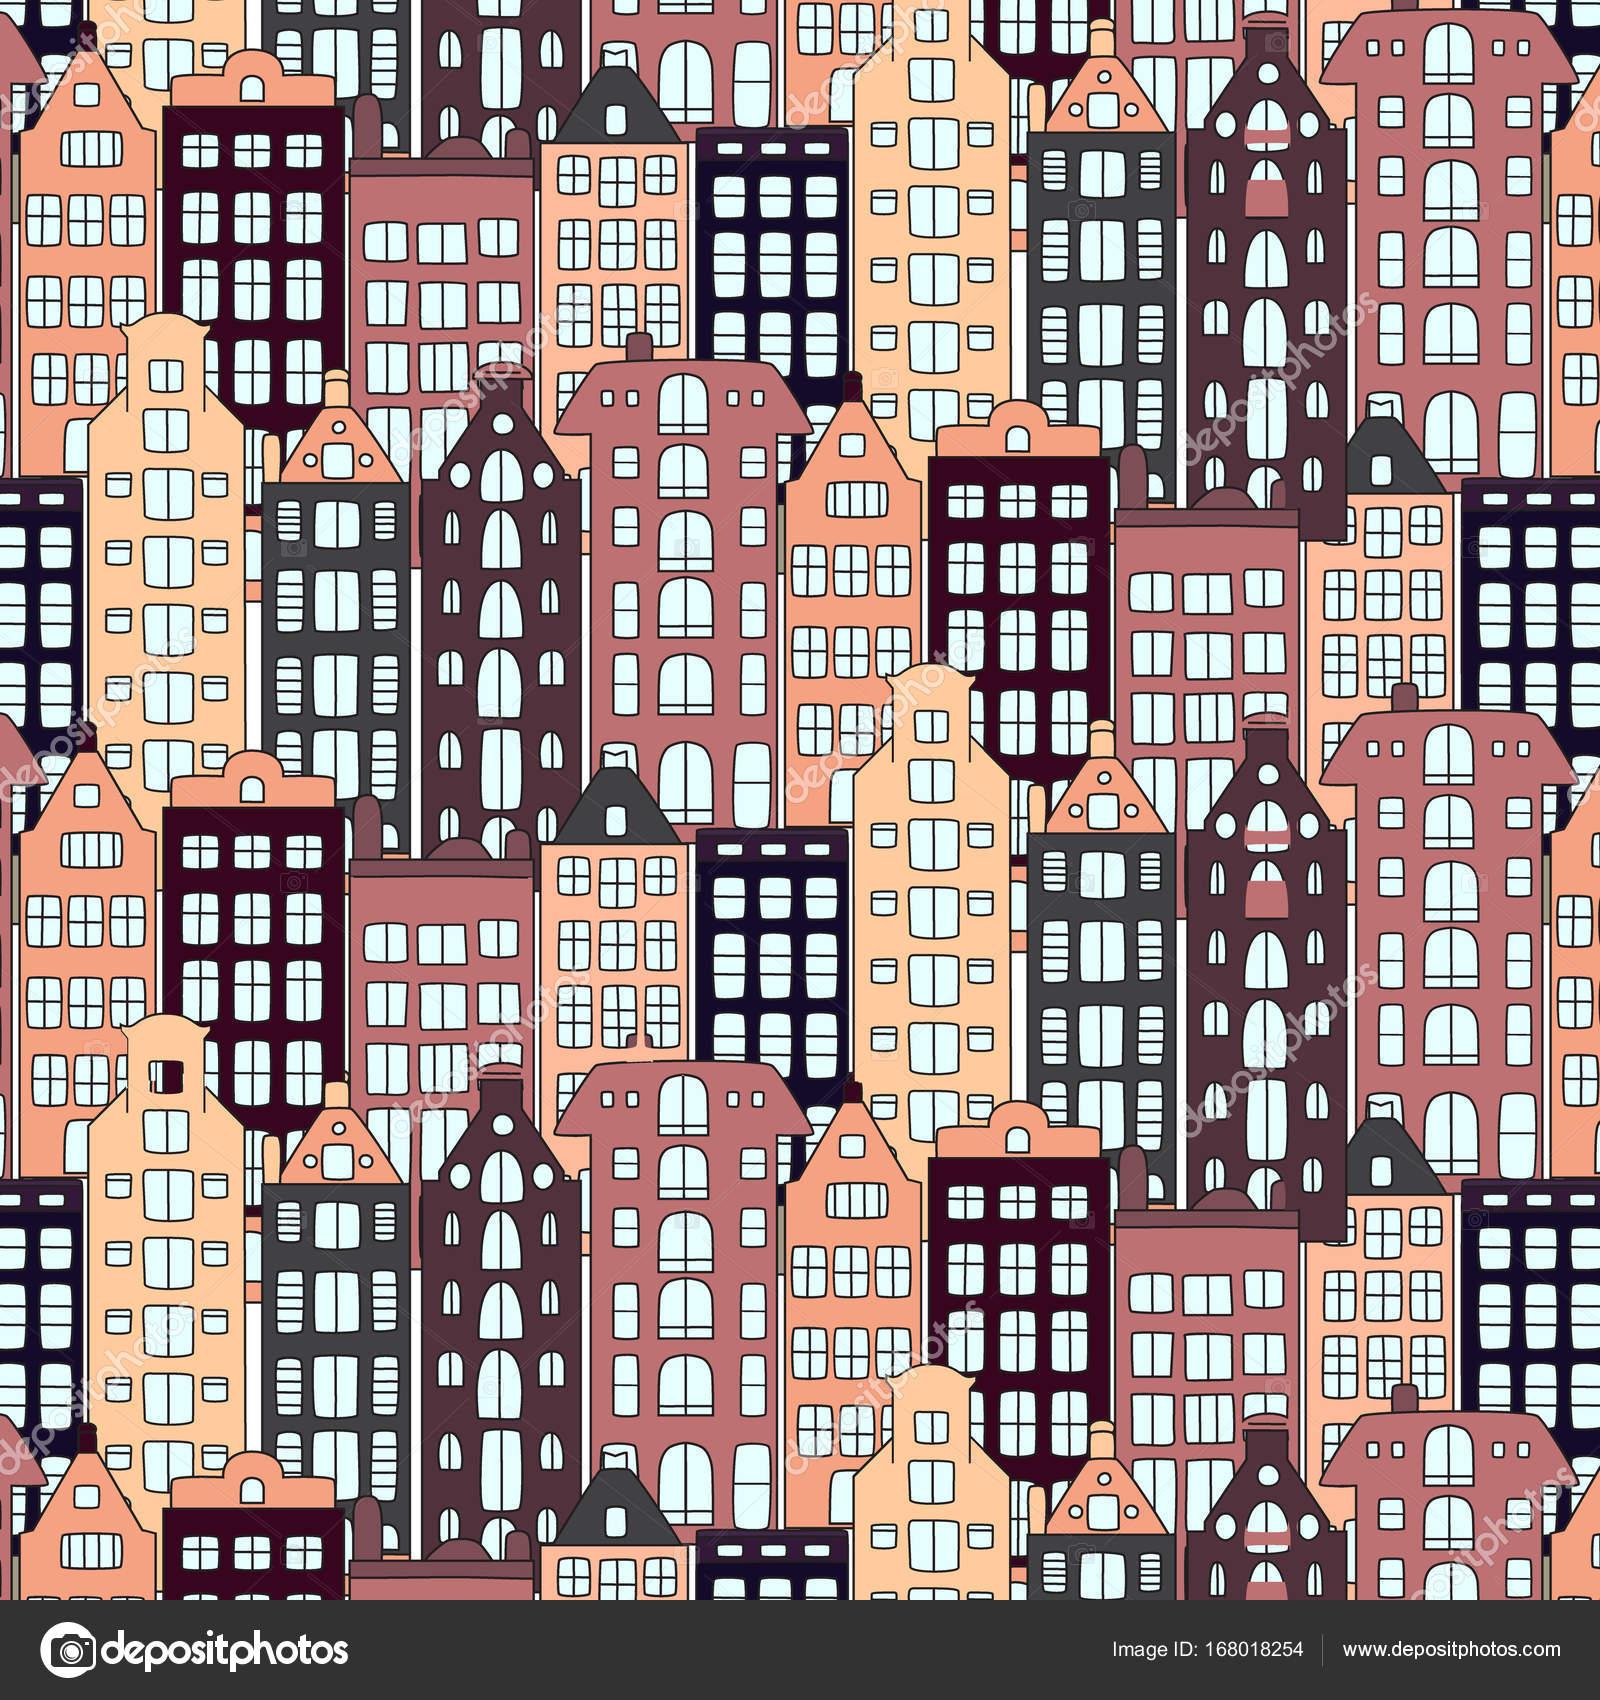 Vektor-Europa-Häuser und Gebäude-Illustration. Urbane Musterstil ...